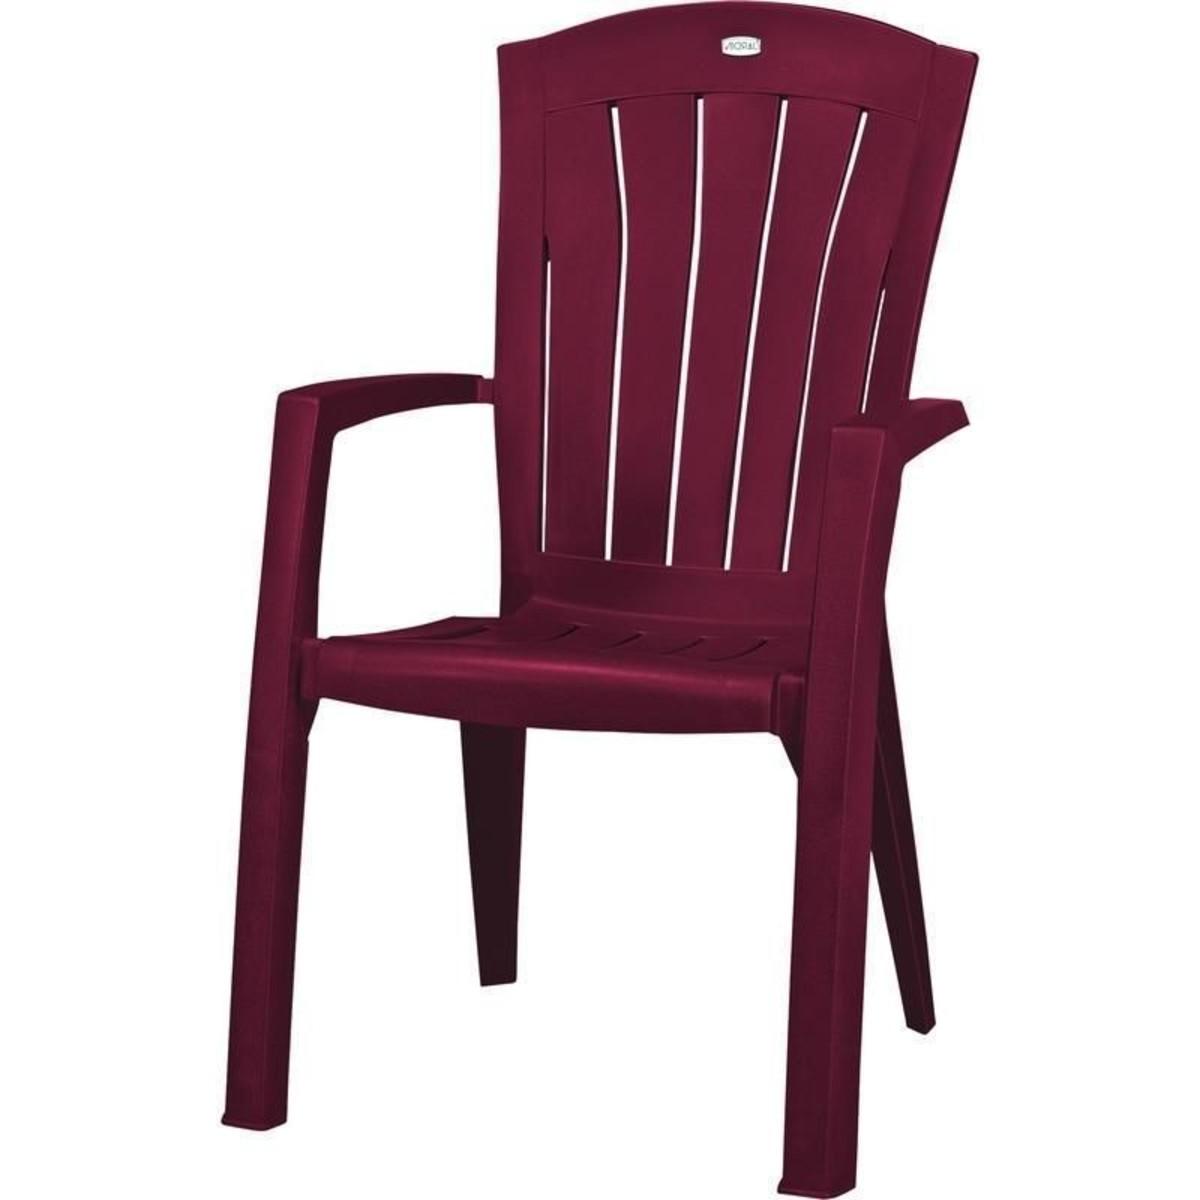 Кресло садовое Санторини бордовое 610x990x650 мм пластик